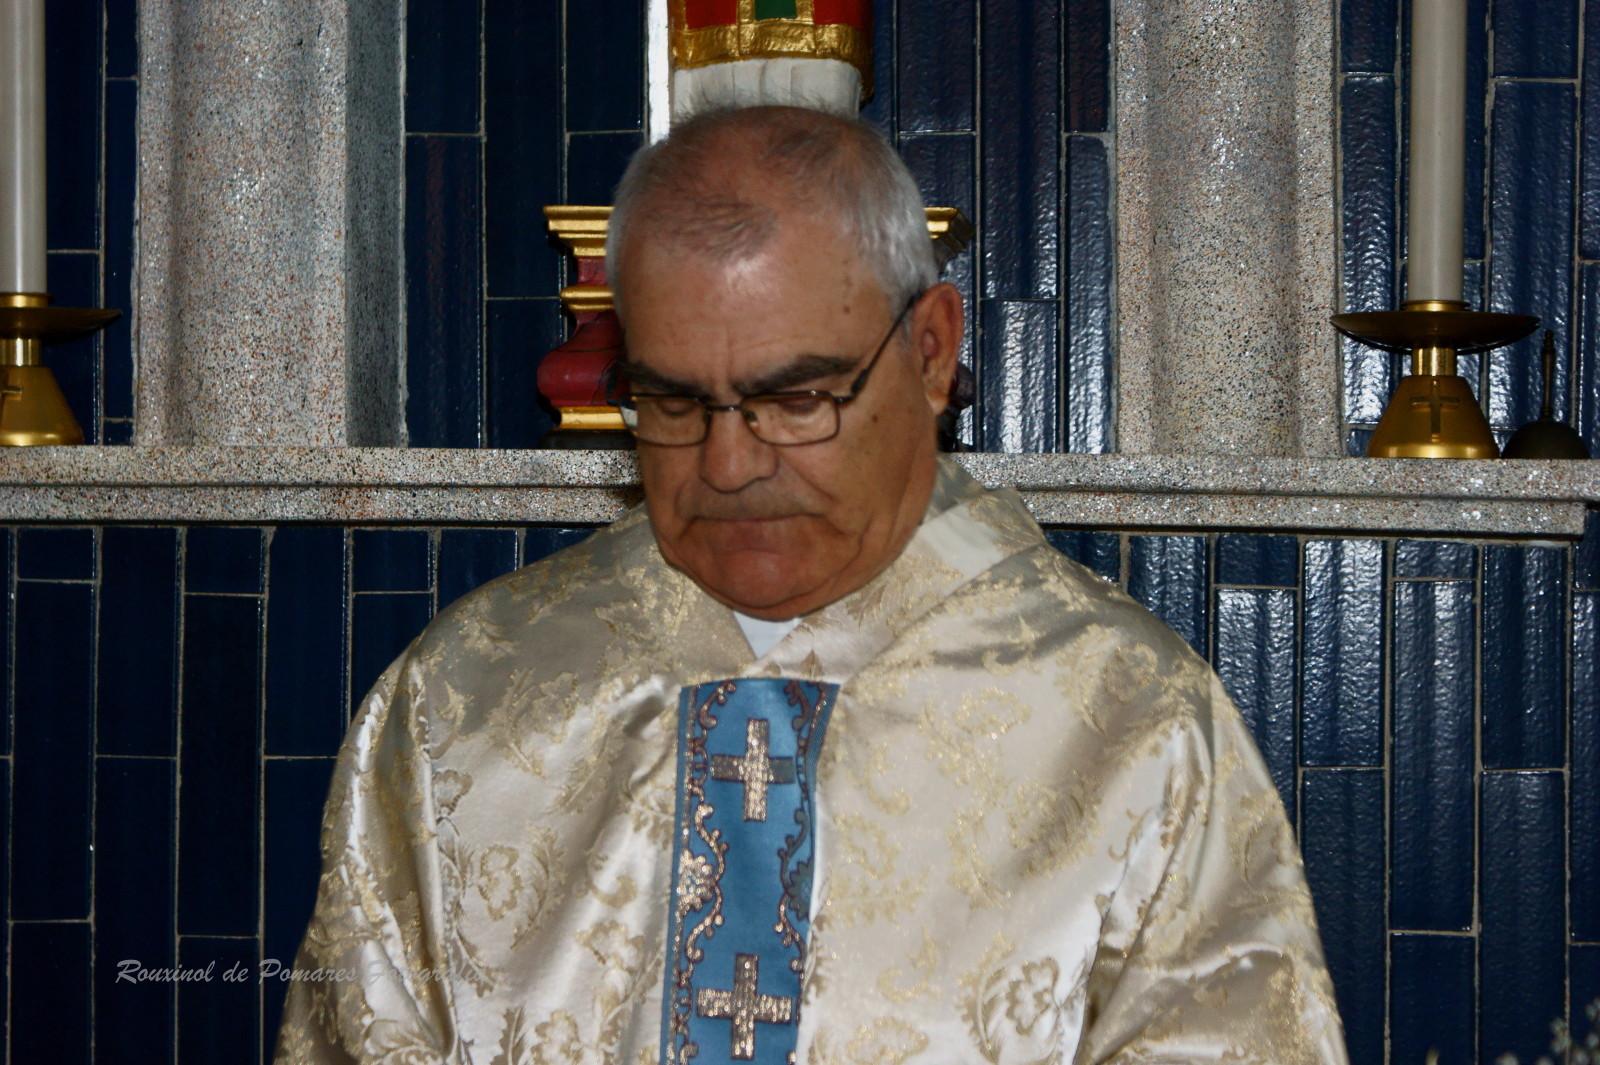 Padre Manuel Cintra - N 2-8-36 F a 27-10-2014